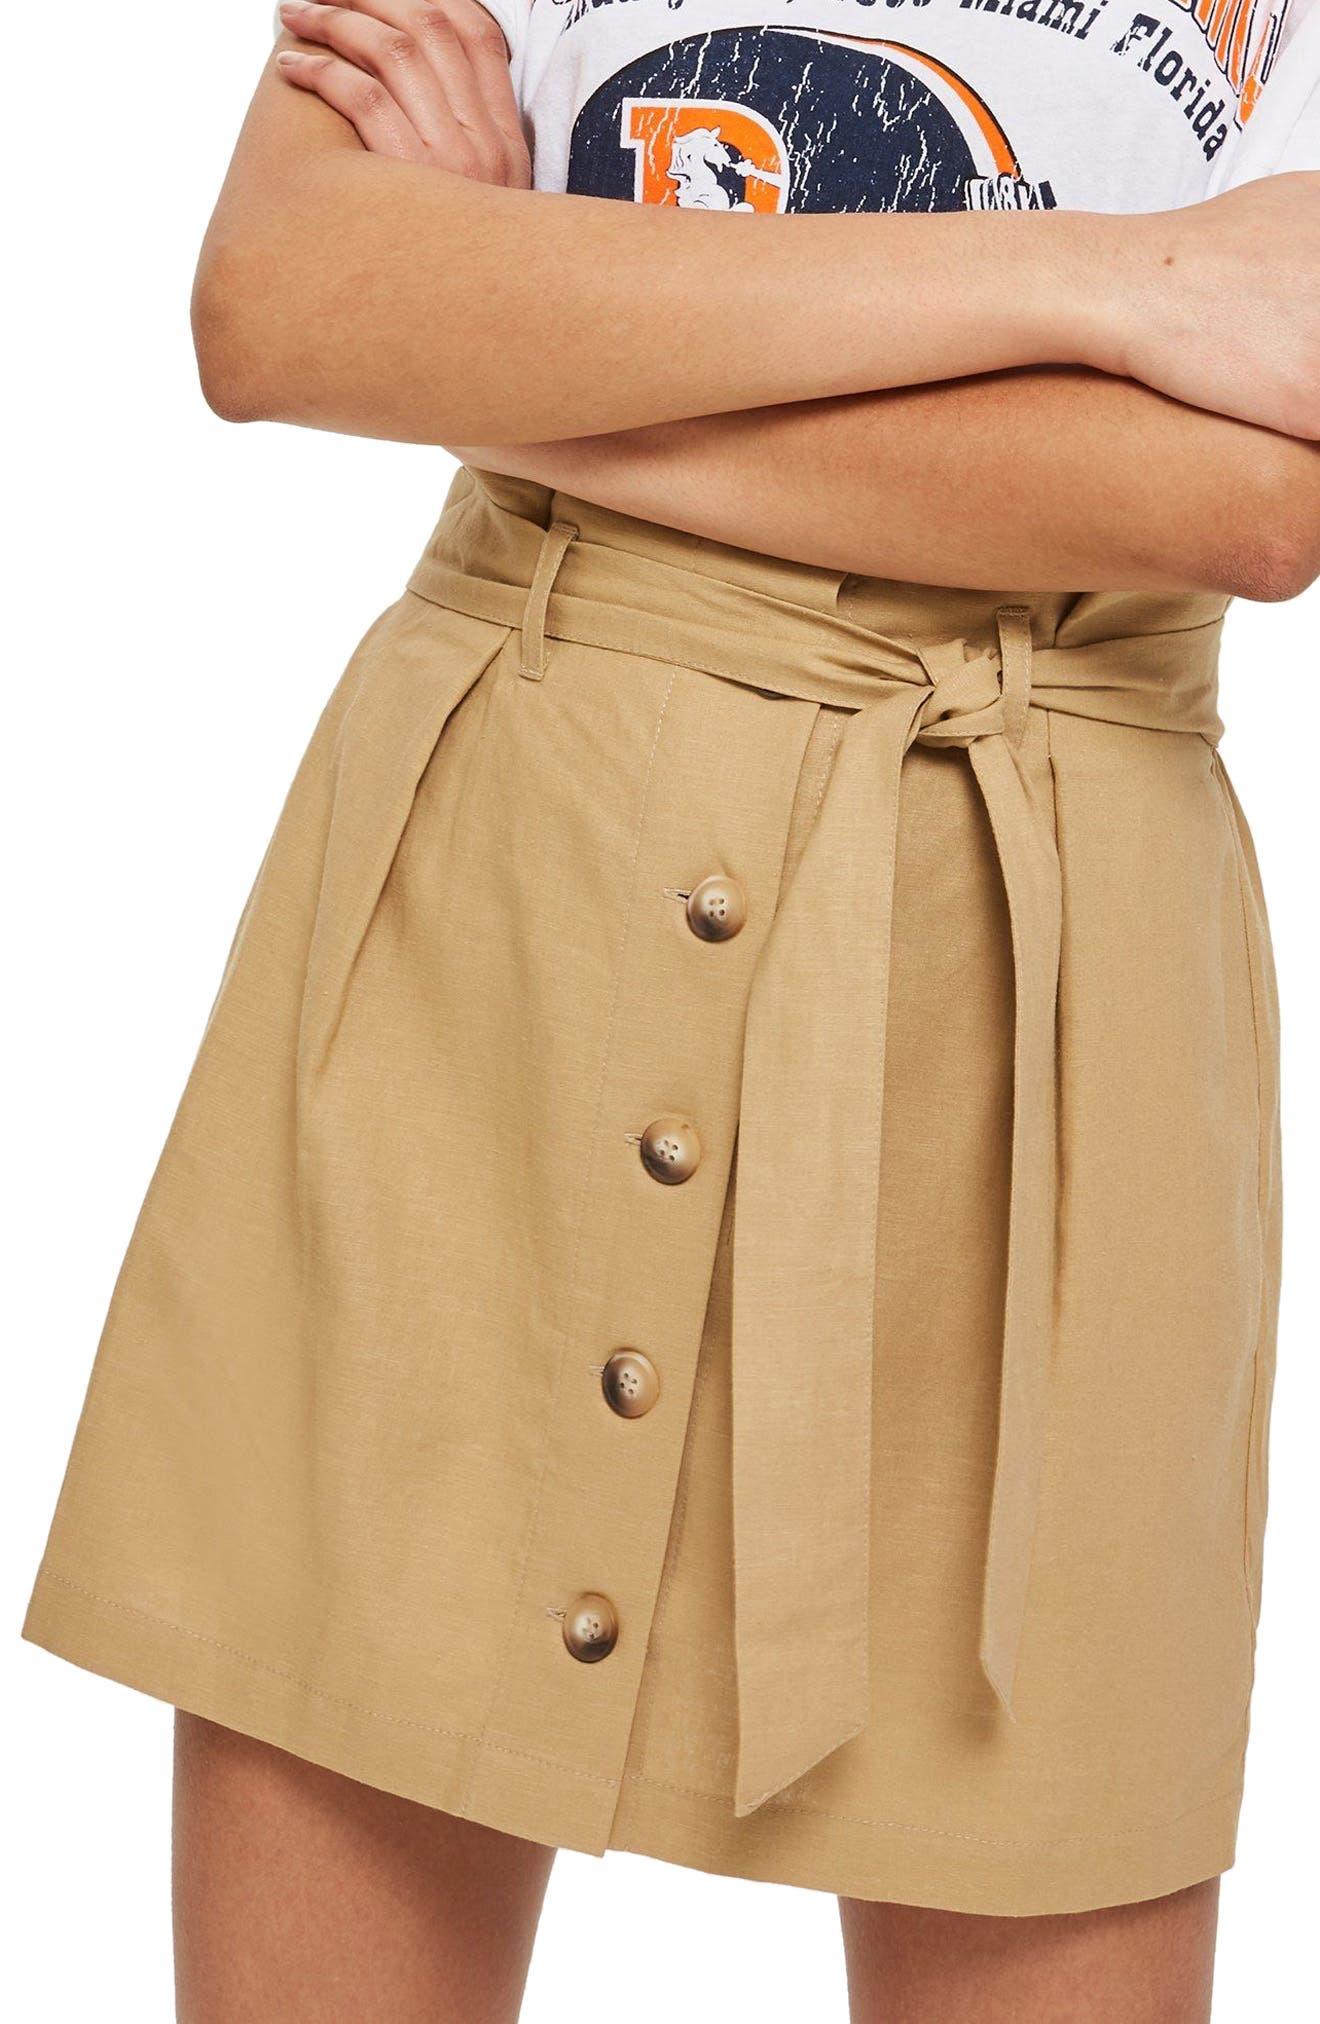 Topshop Linen Button Paperbag Miniskirt, US (fits like 14) - Beige